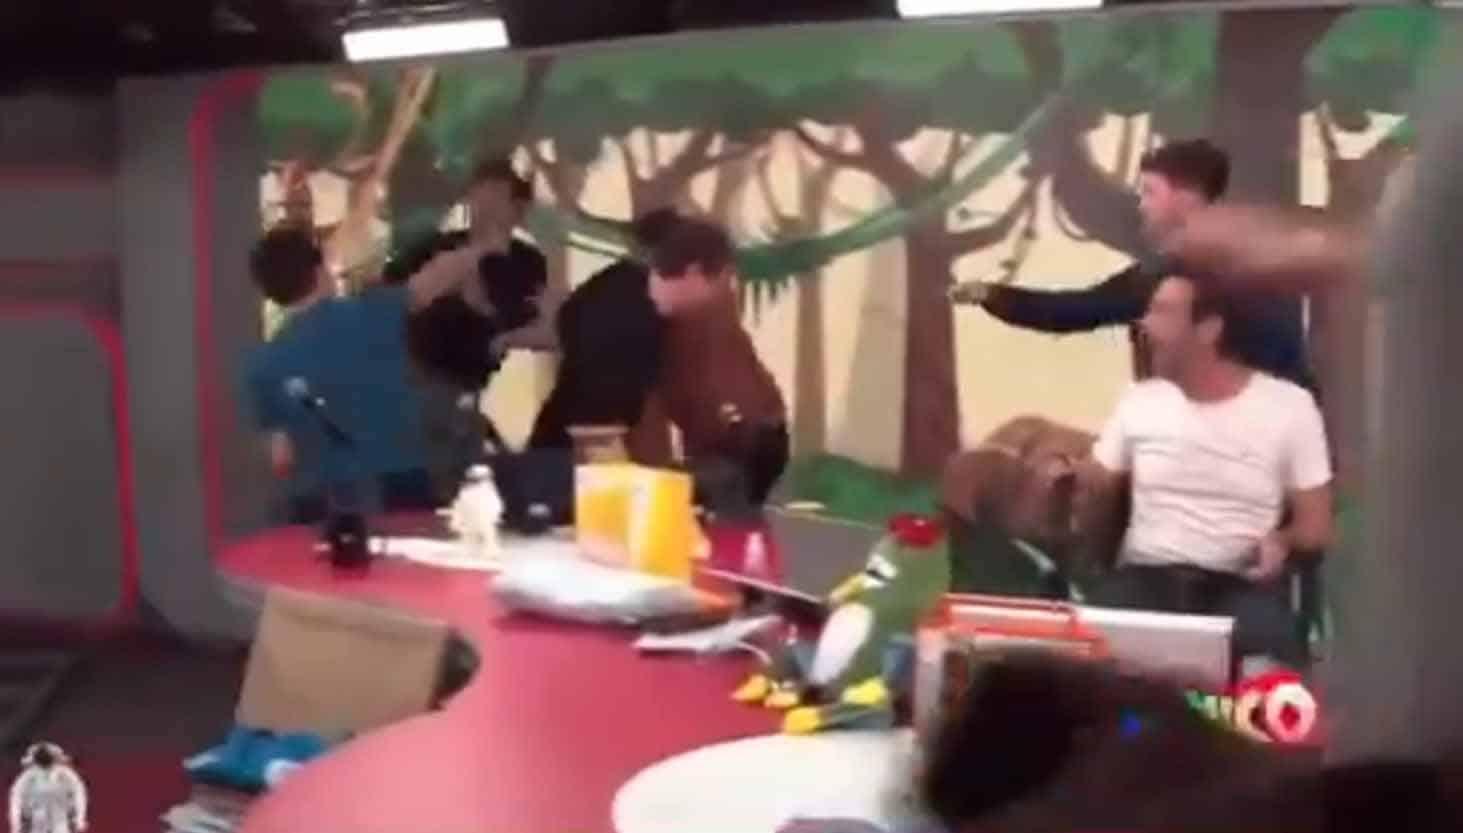 Vídeo: Bolsonarista agride ex-bolsonarista do Pânico, na Jovem Pan